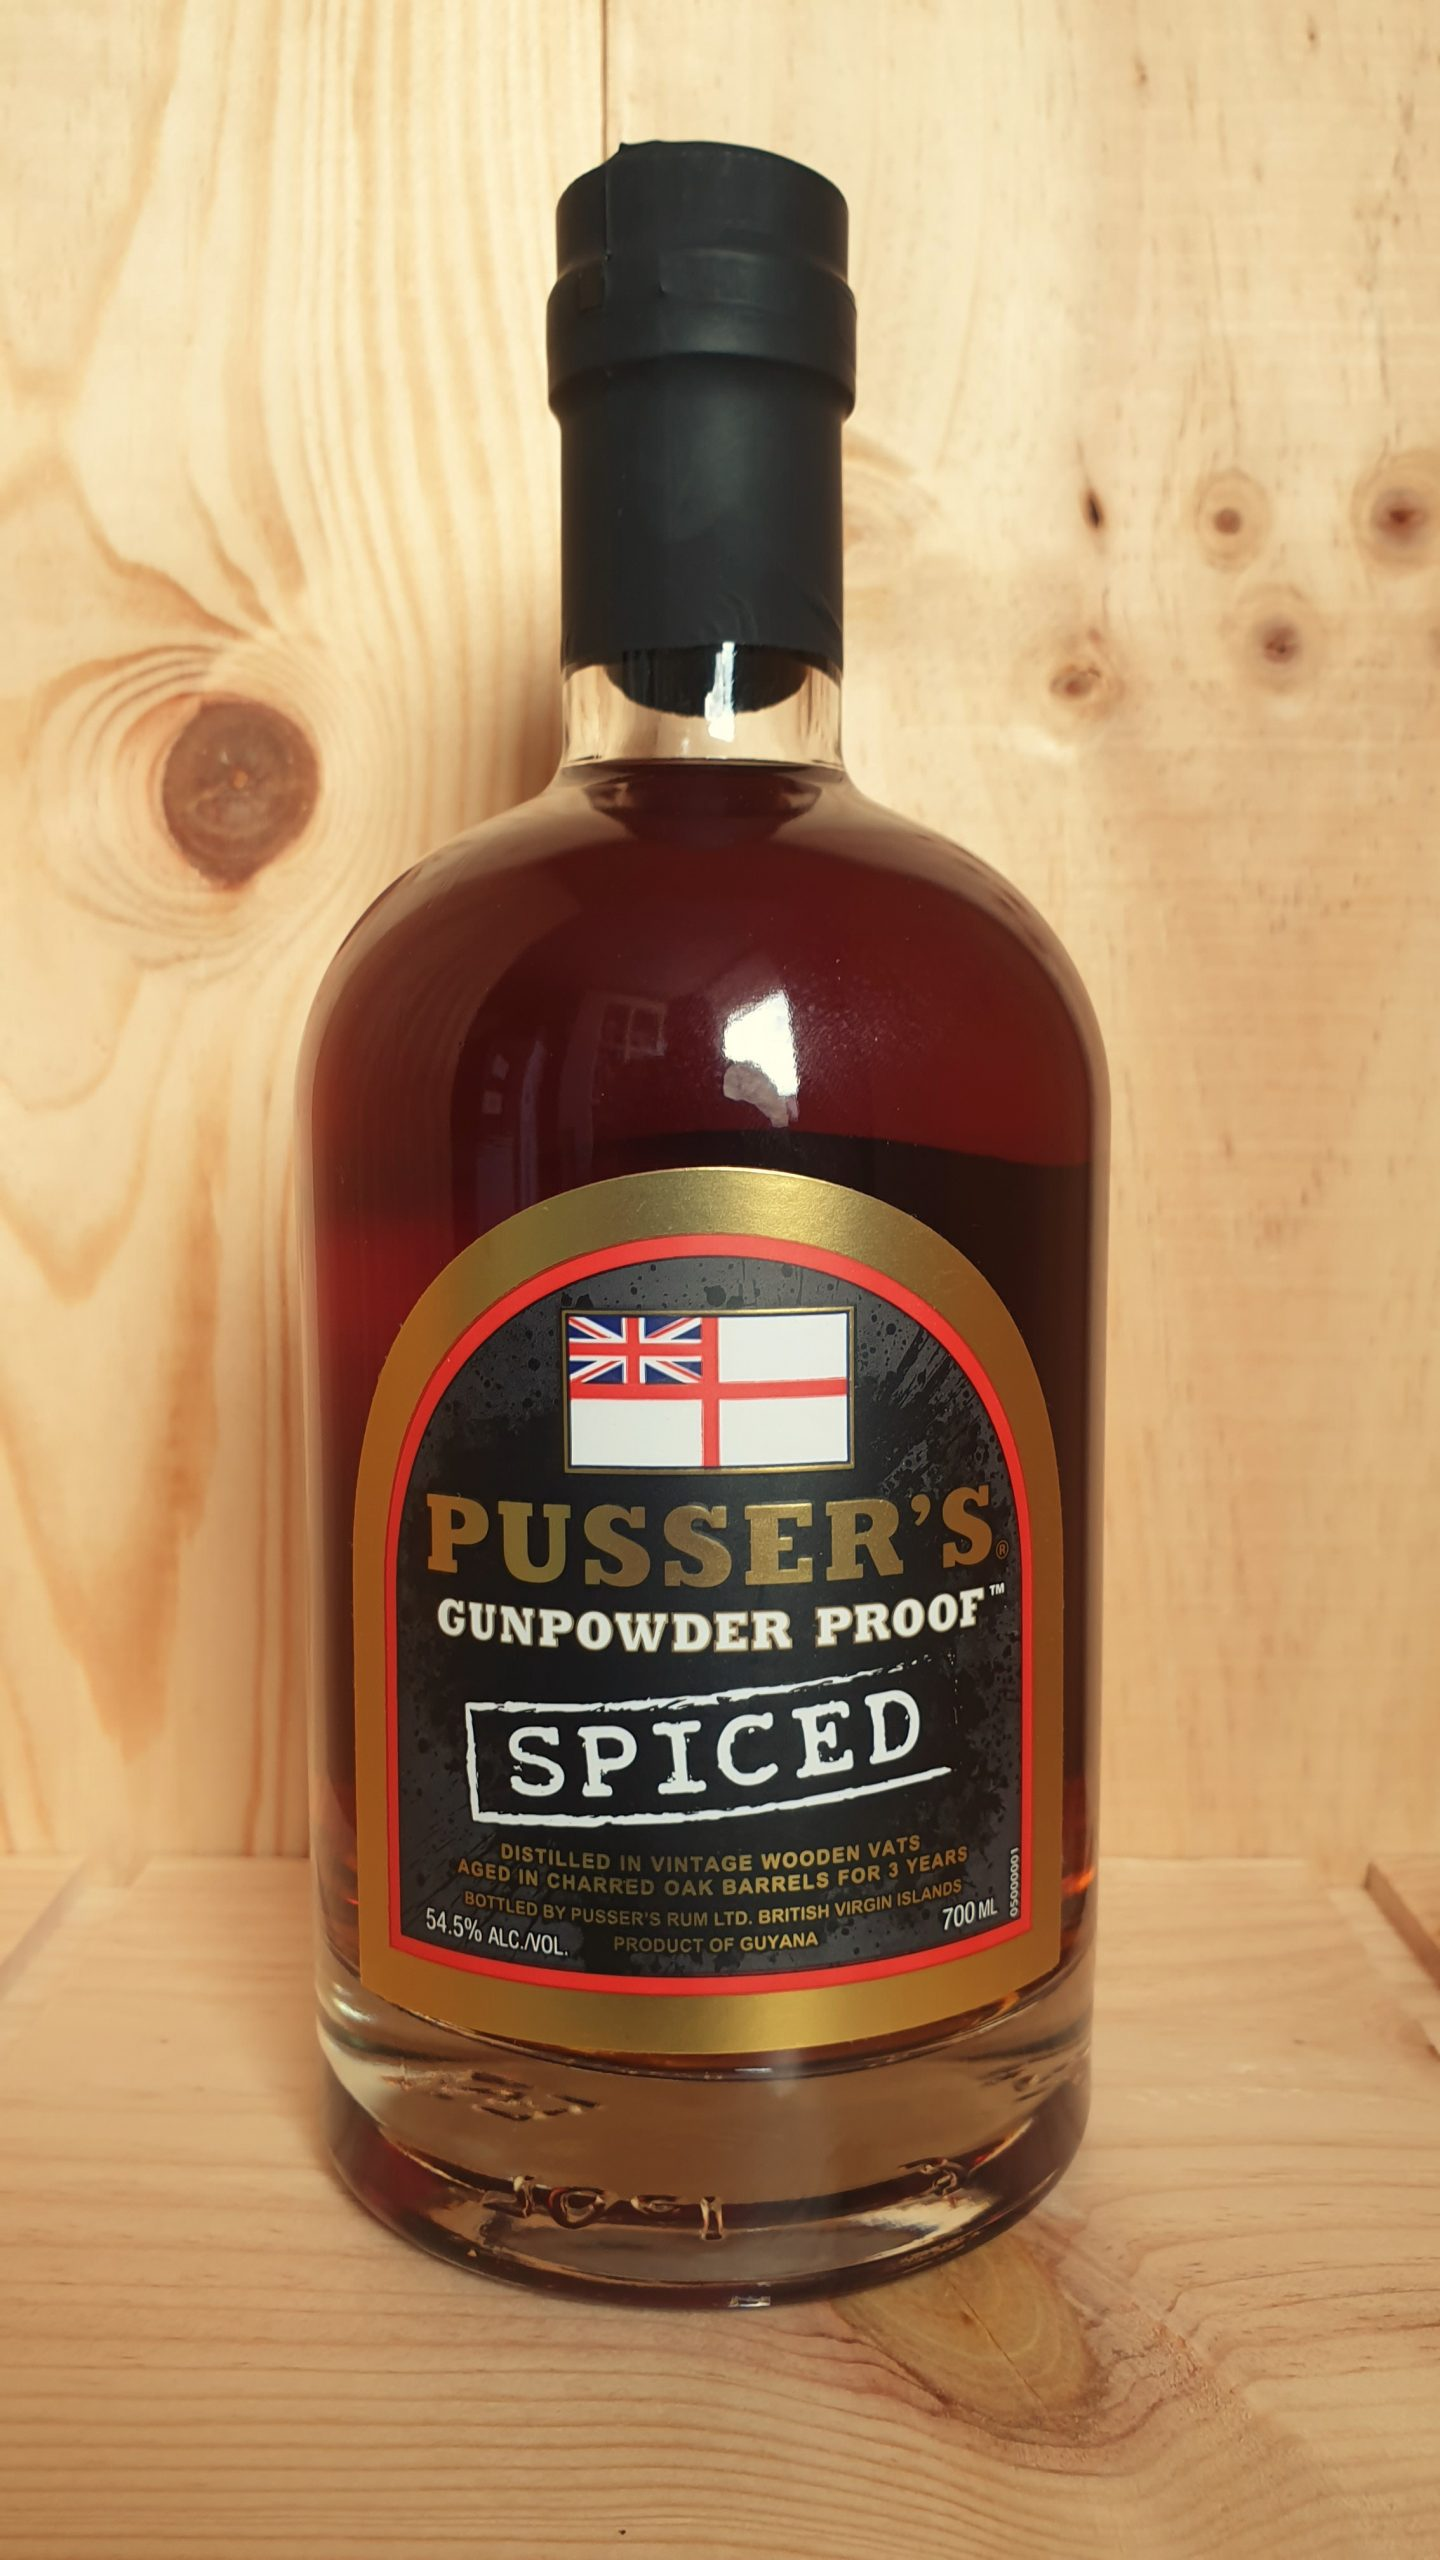 Pussers Gunpowder Proof Spiced 54.5%